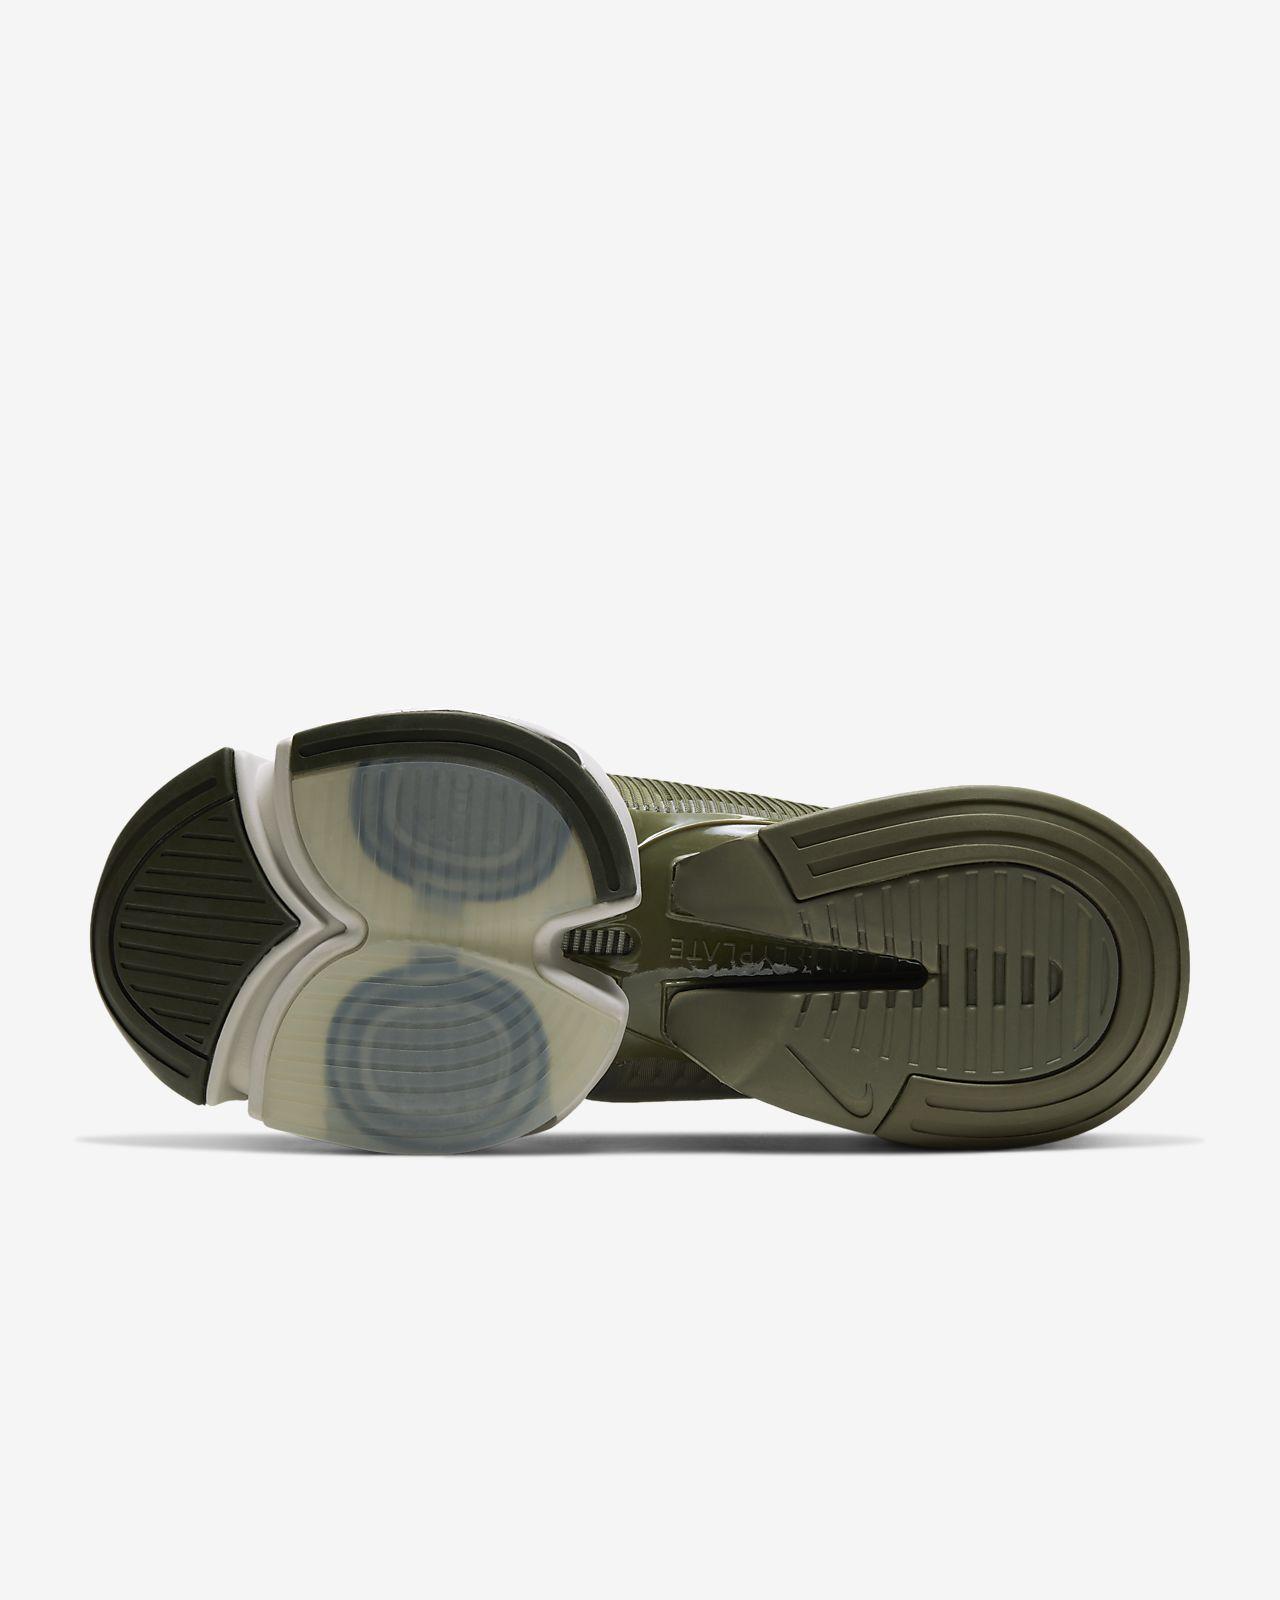 Nike Zoom Mercurial xi FK Football Schuhe, Herren, Farbe